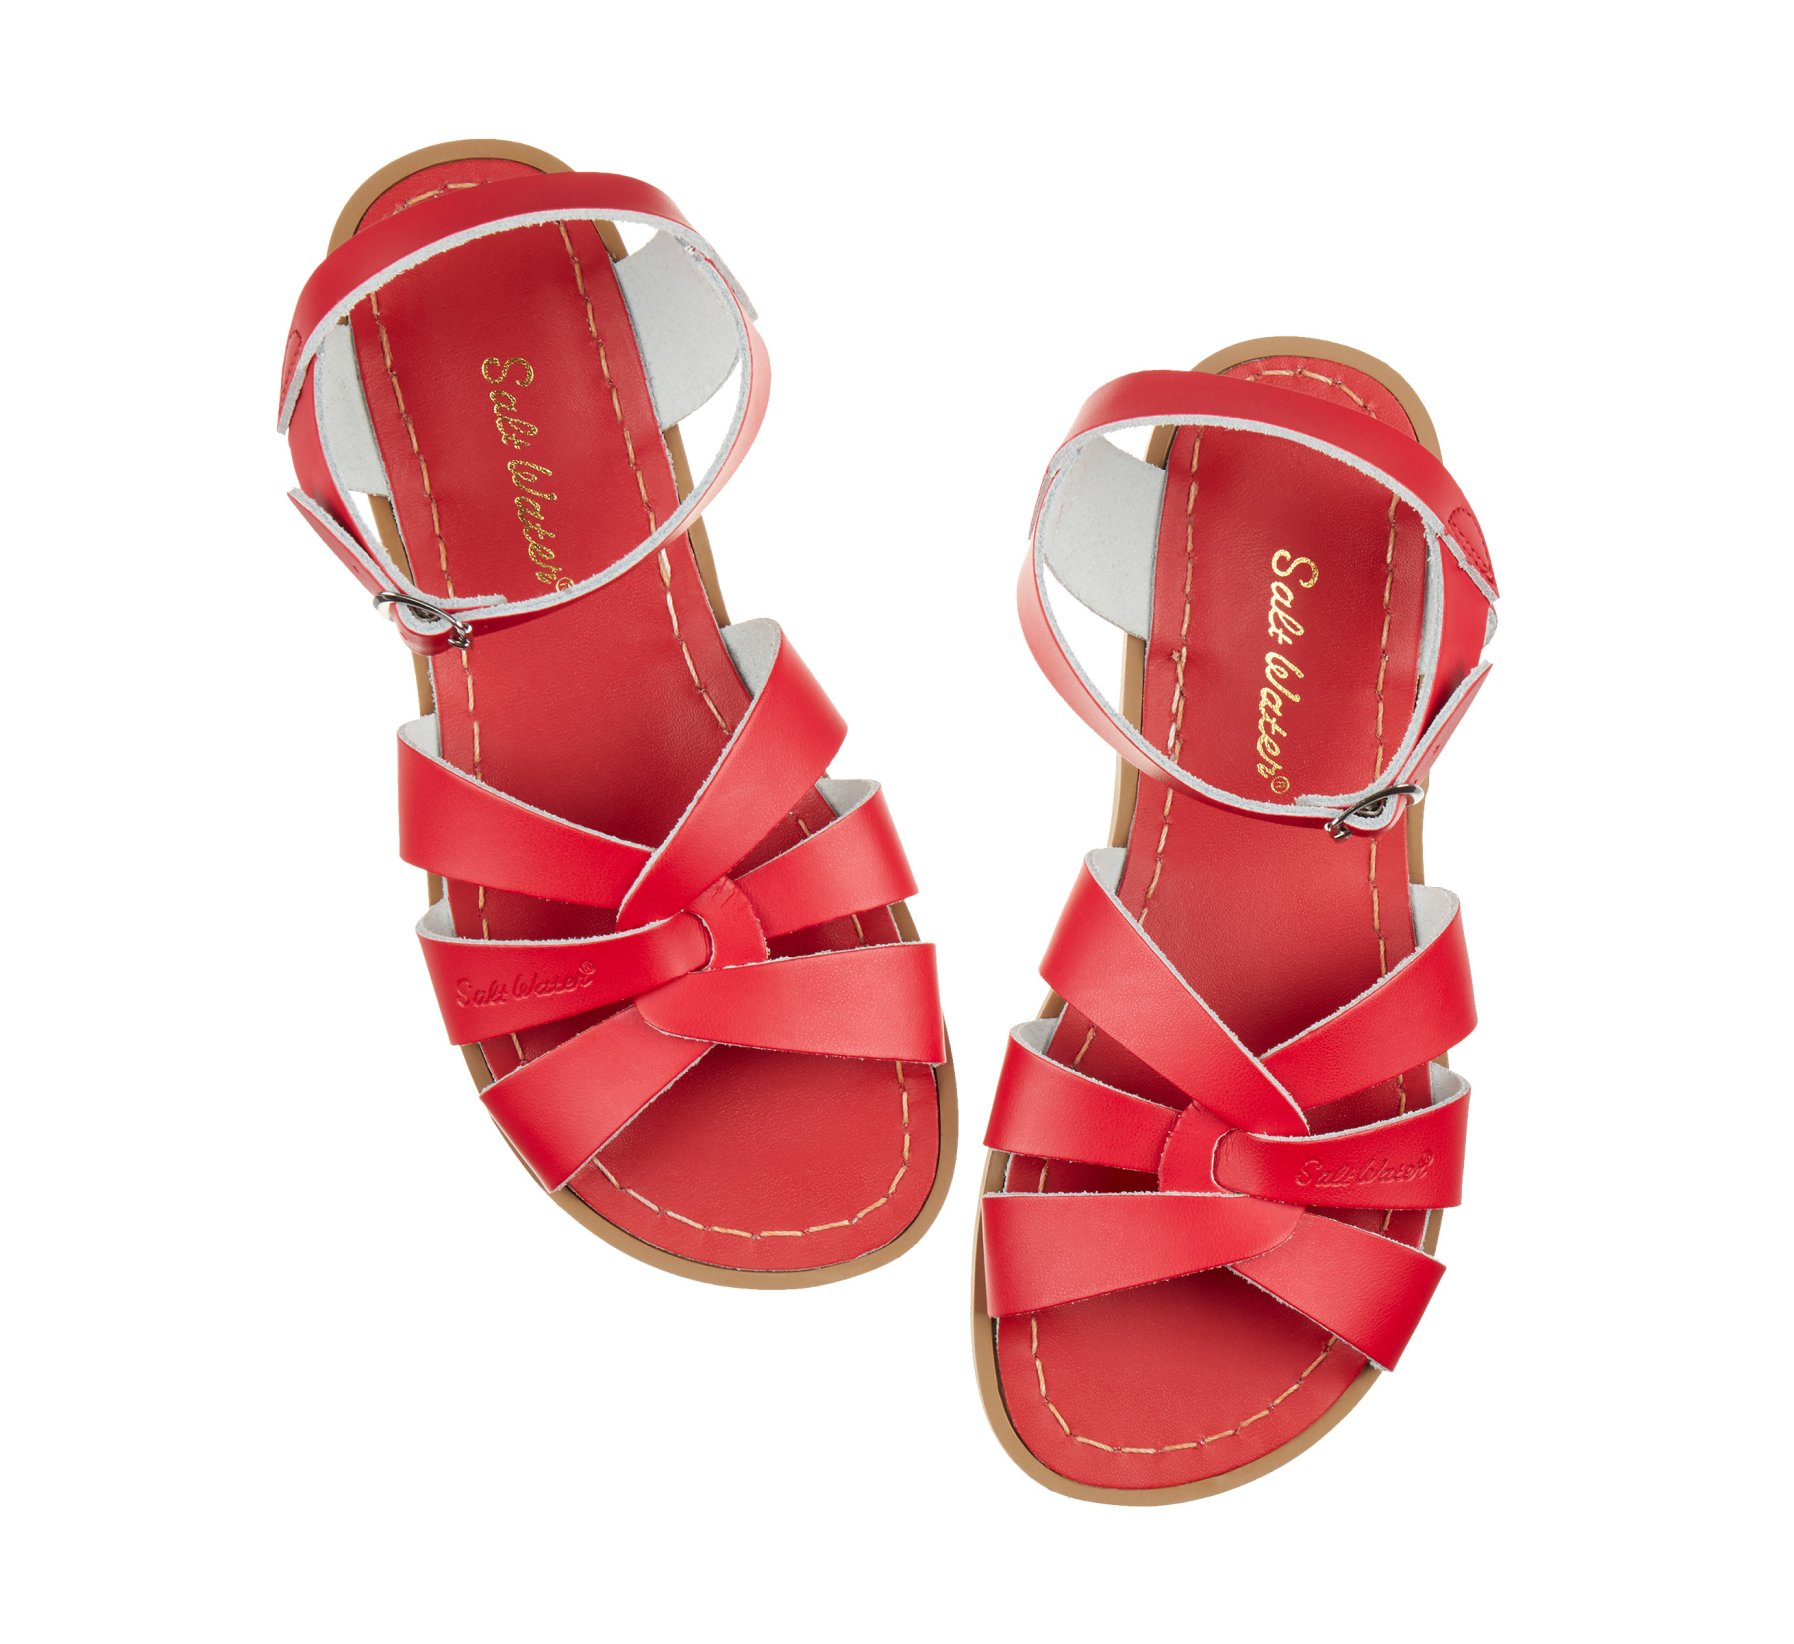 Original in Rot - Salt Water Sandals